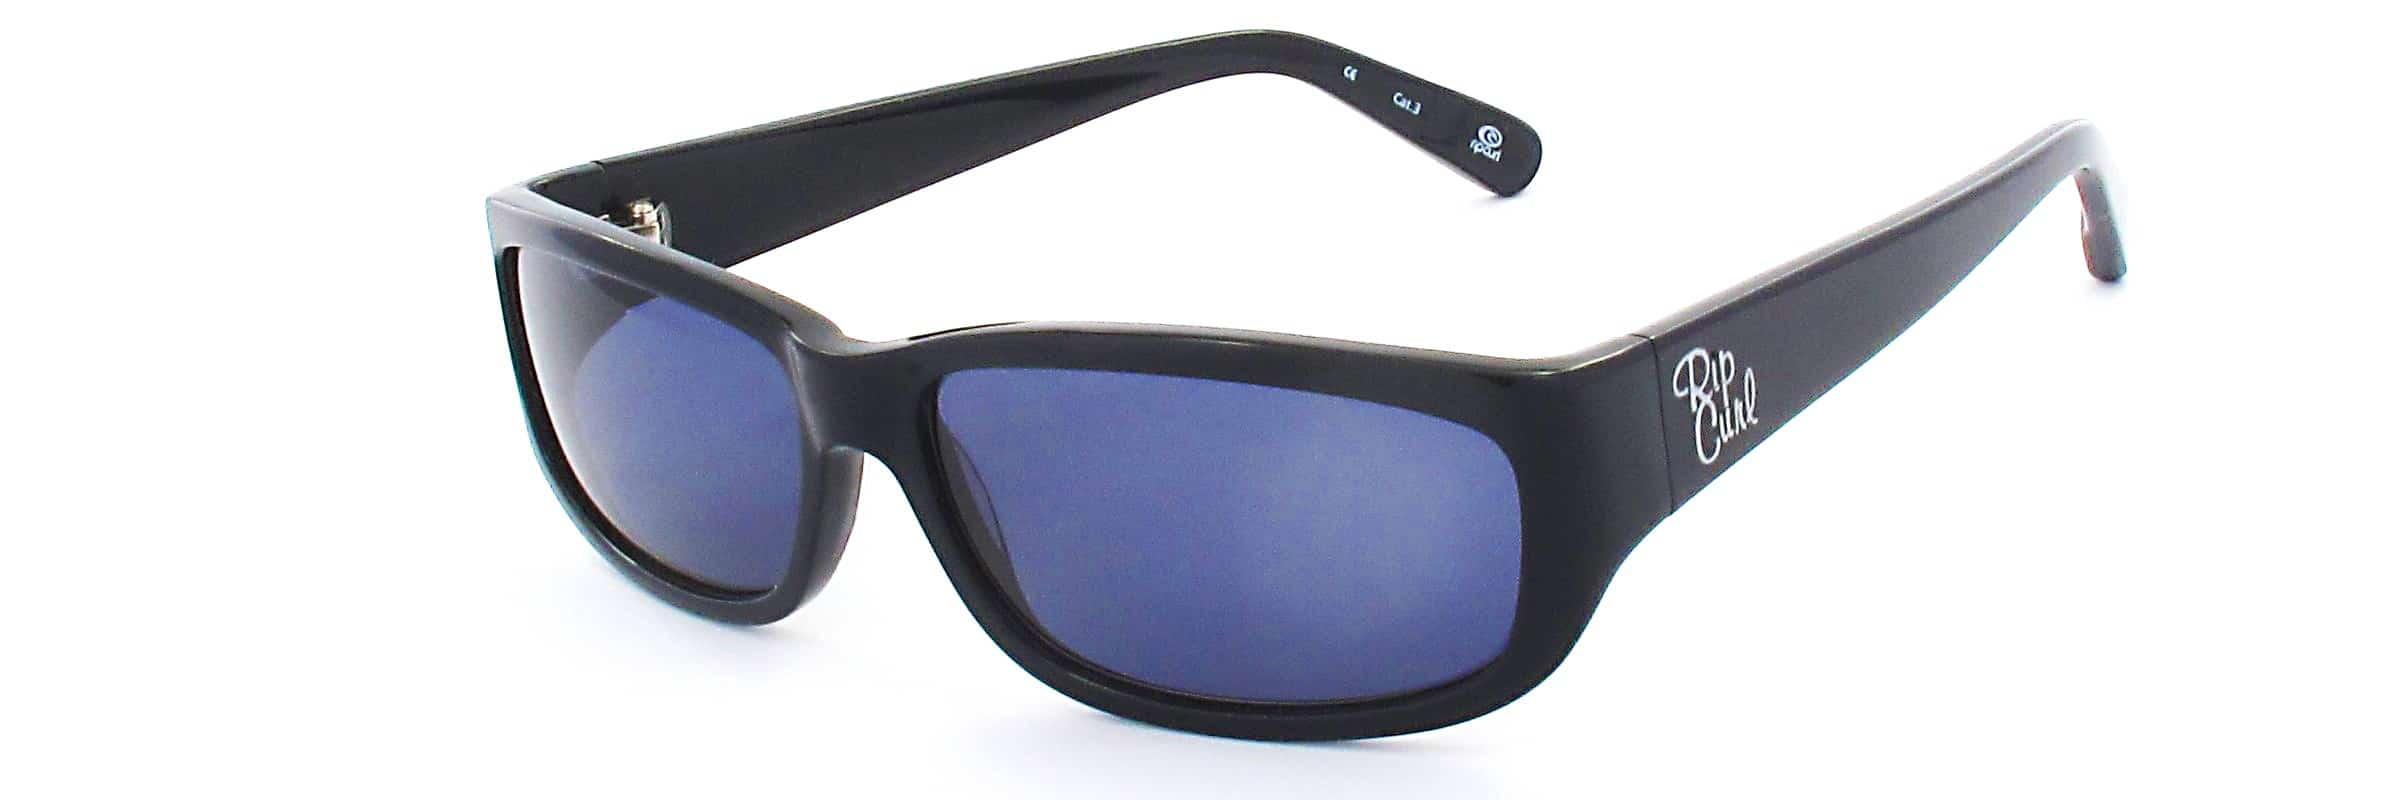 ripcurl-noir